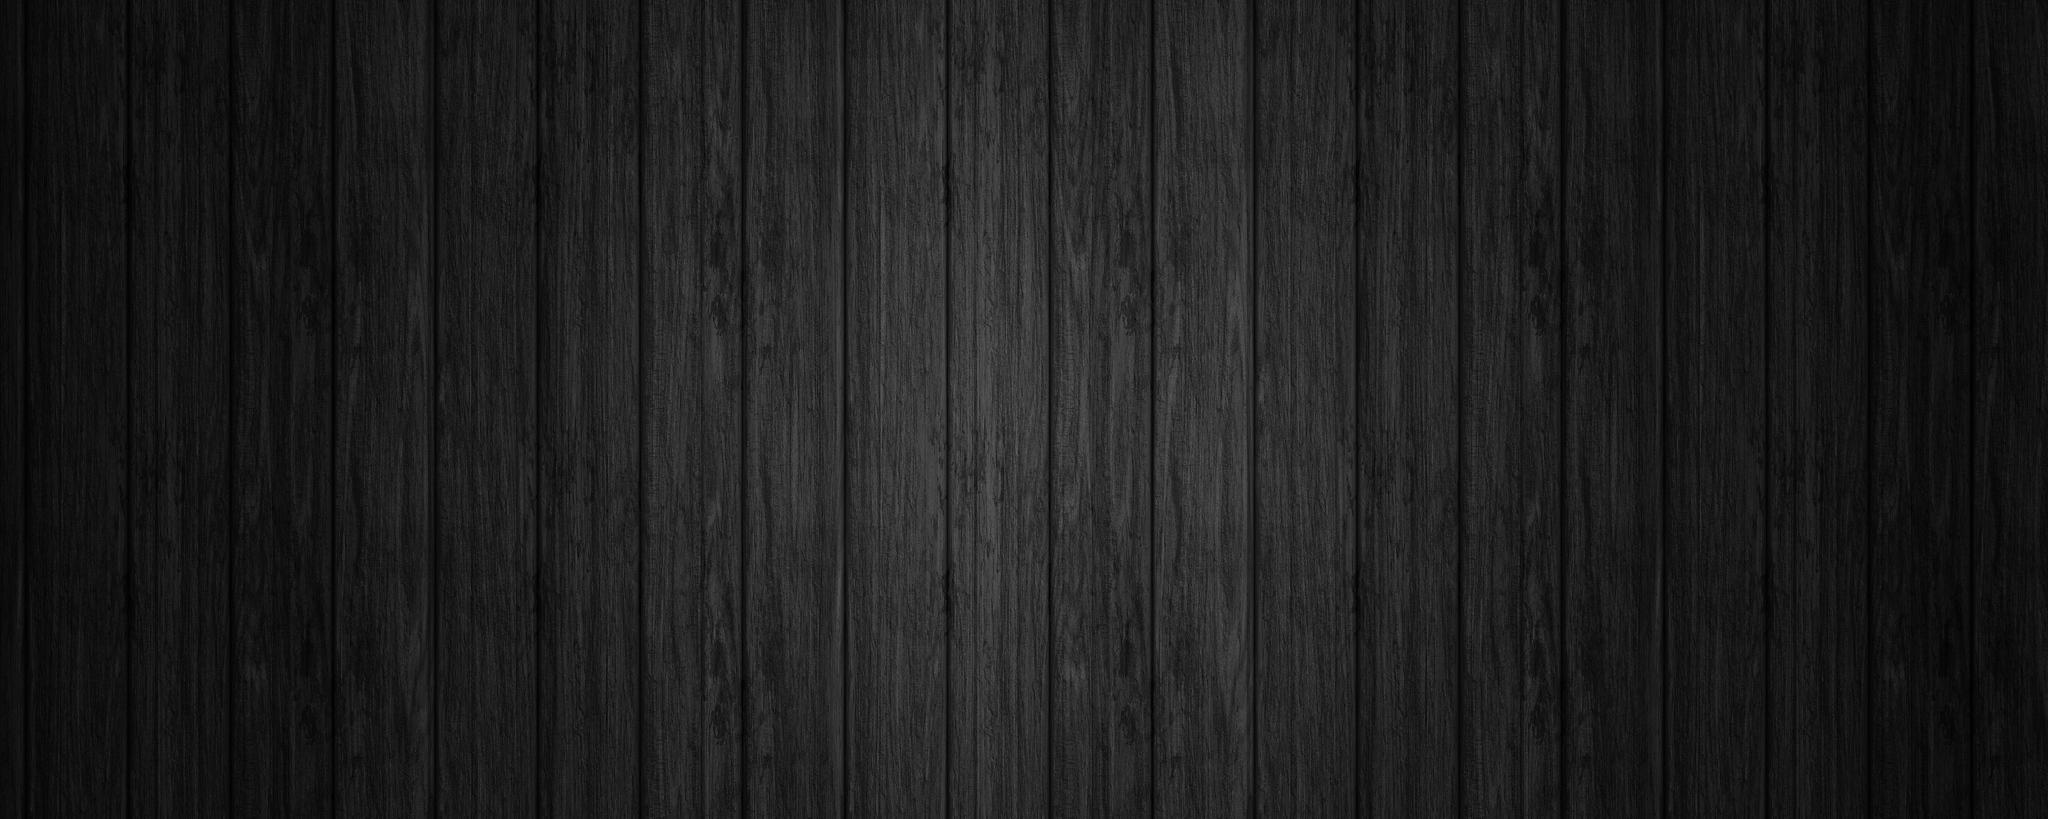 board_black_line_texture_background_wood